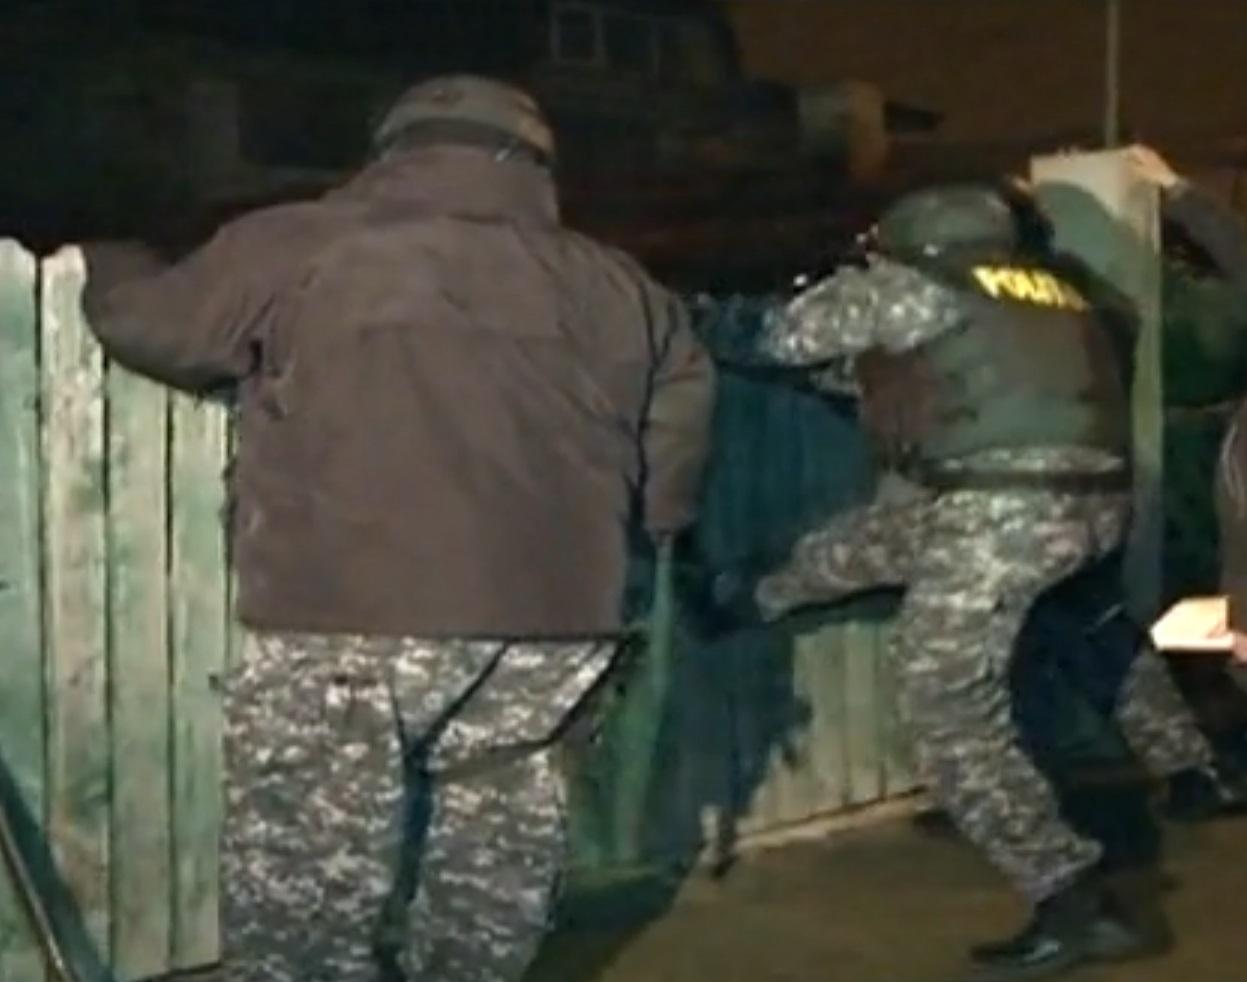 Politia a dat buzna peste traficanti la primele ore